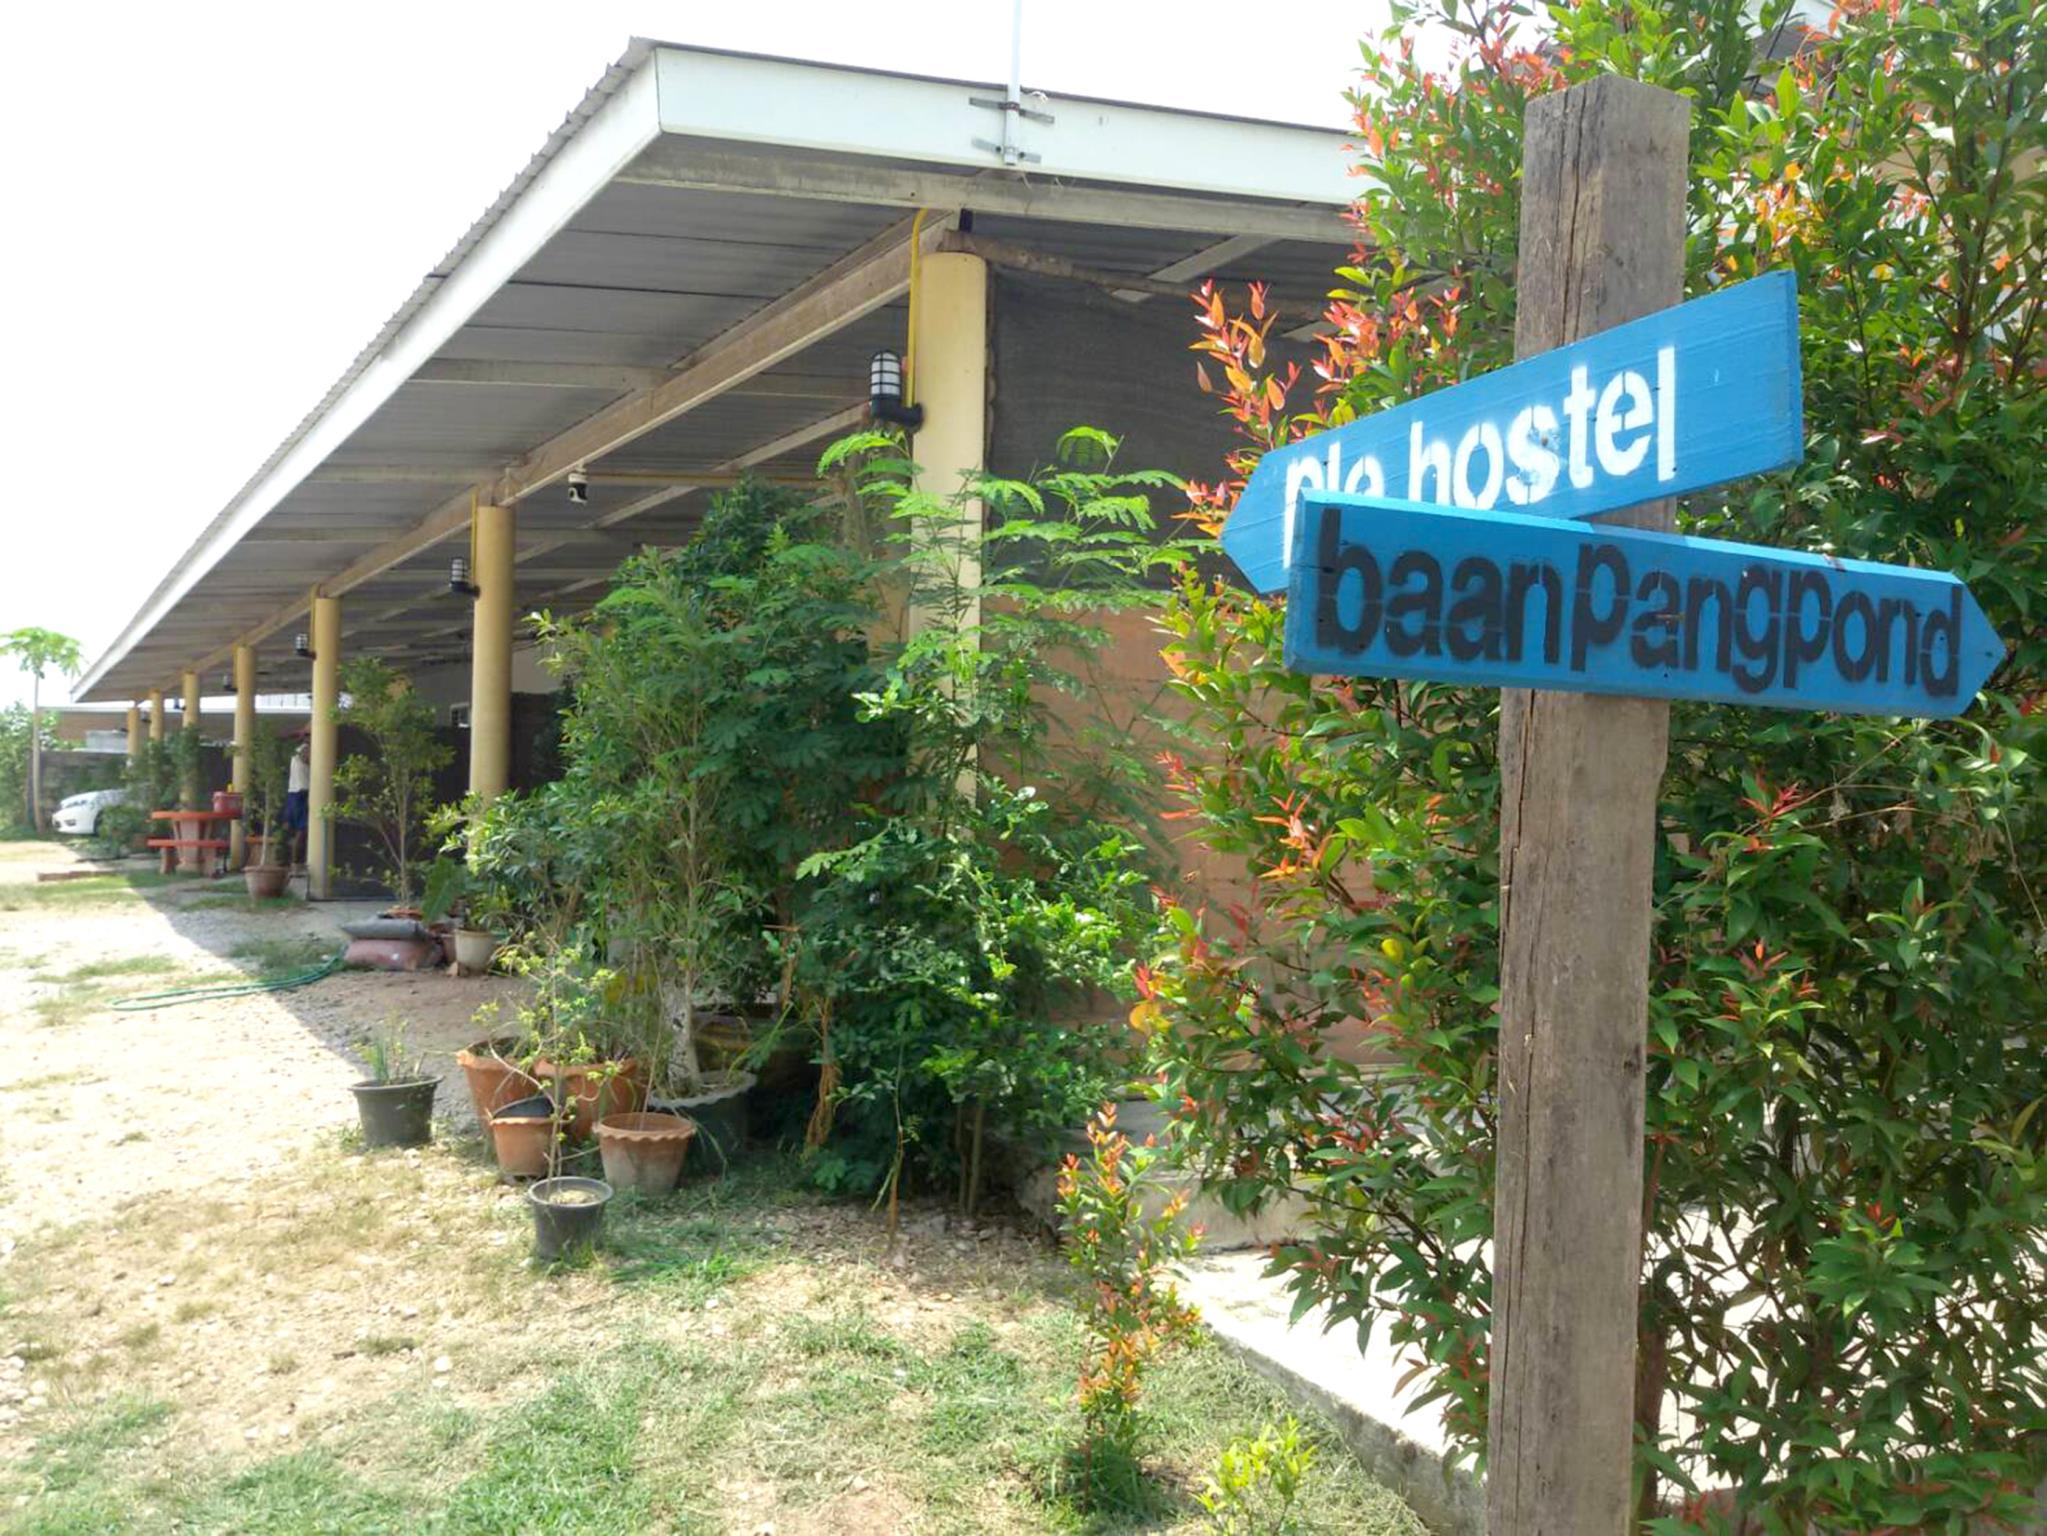 Ple Hostel